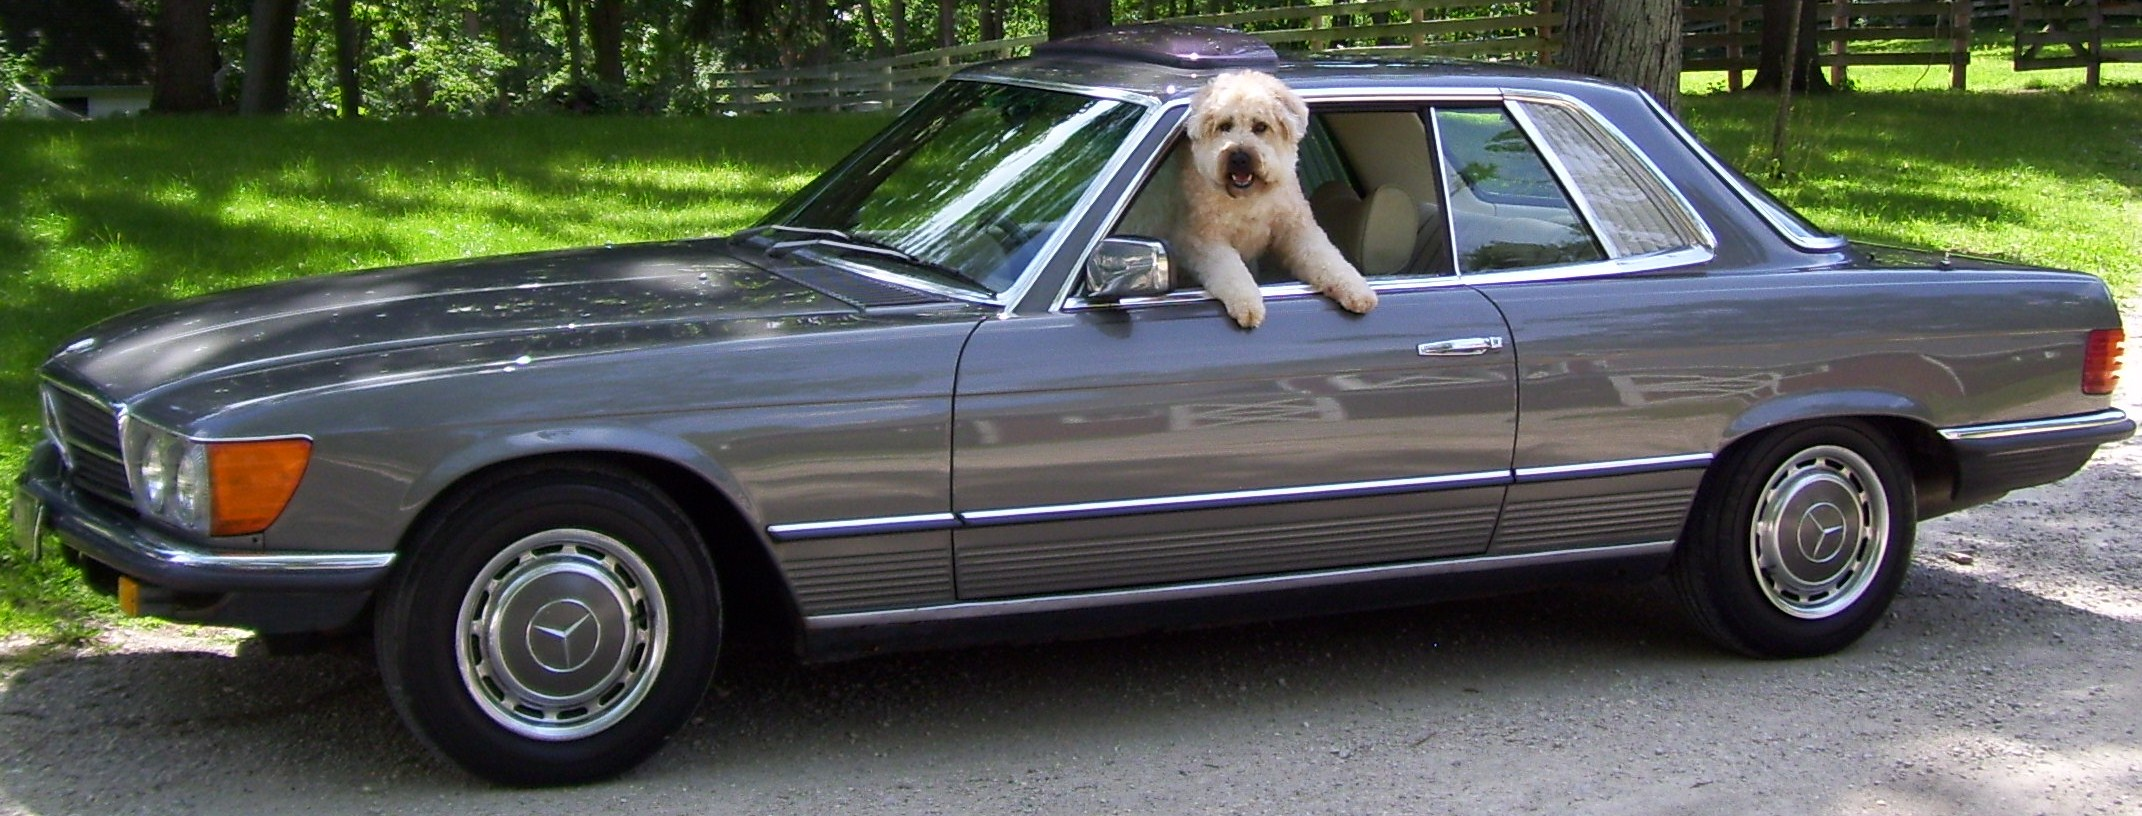 Fav Car